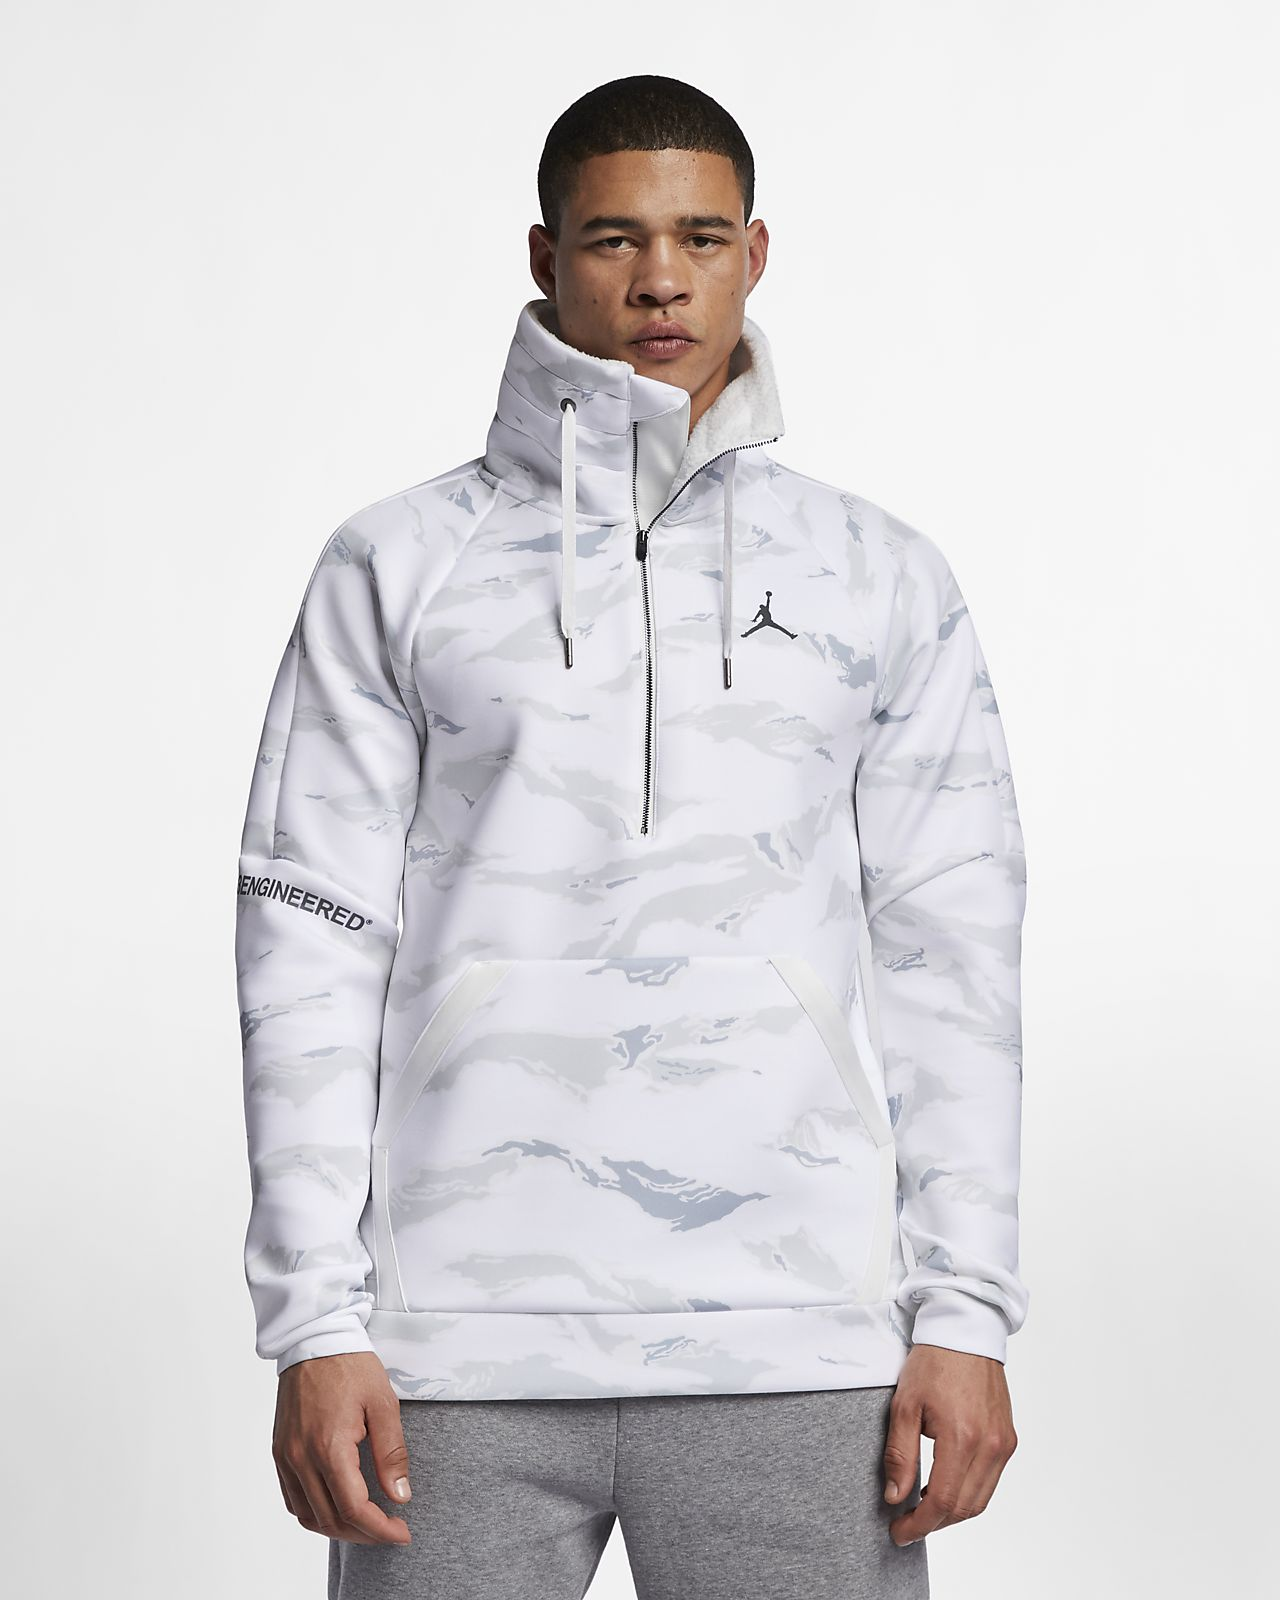 70ae893f0ab284 Jordan Sportswear Flight Tech Men s Camo Anorak. Nike.com AU